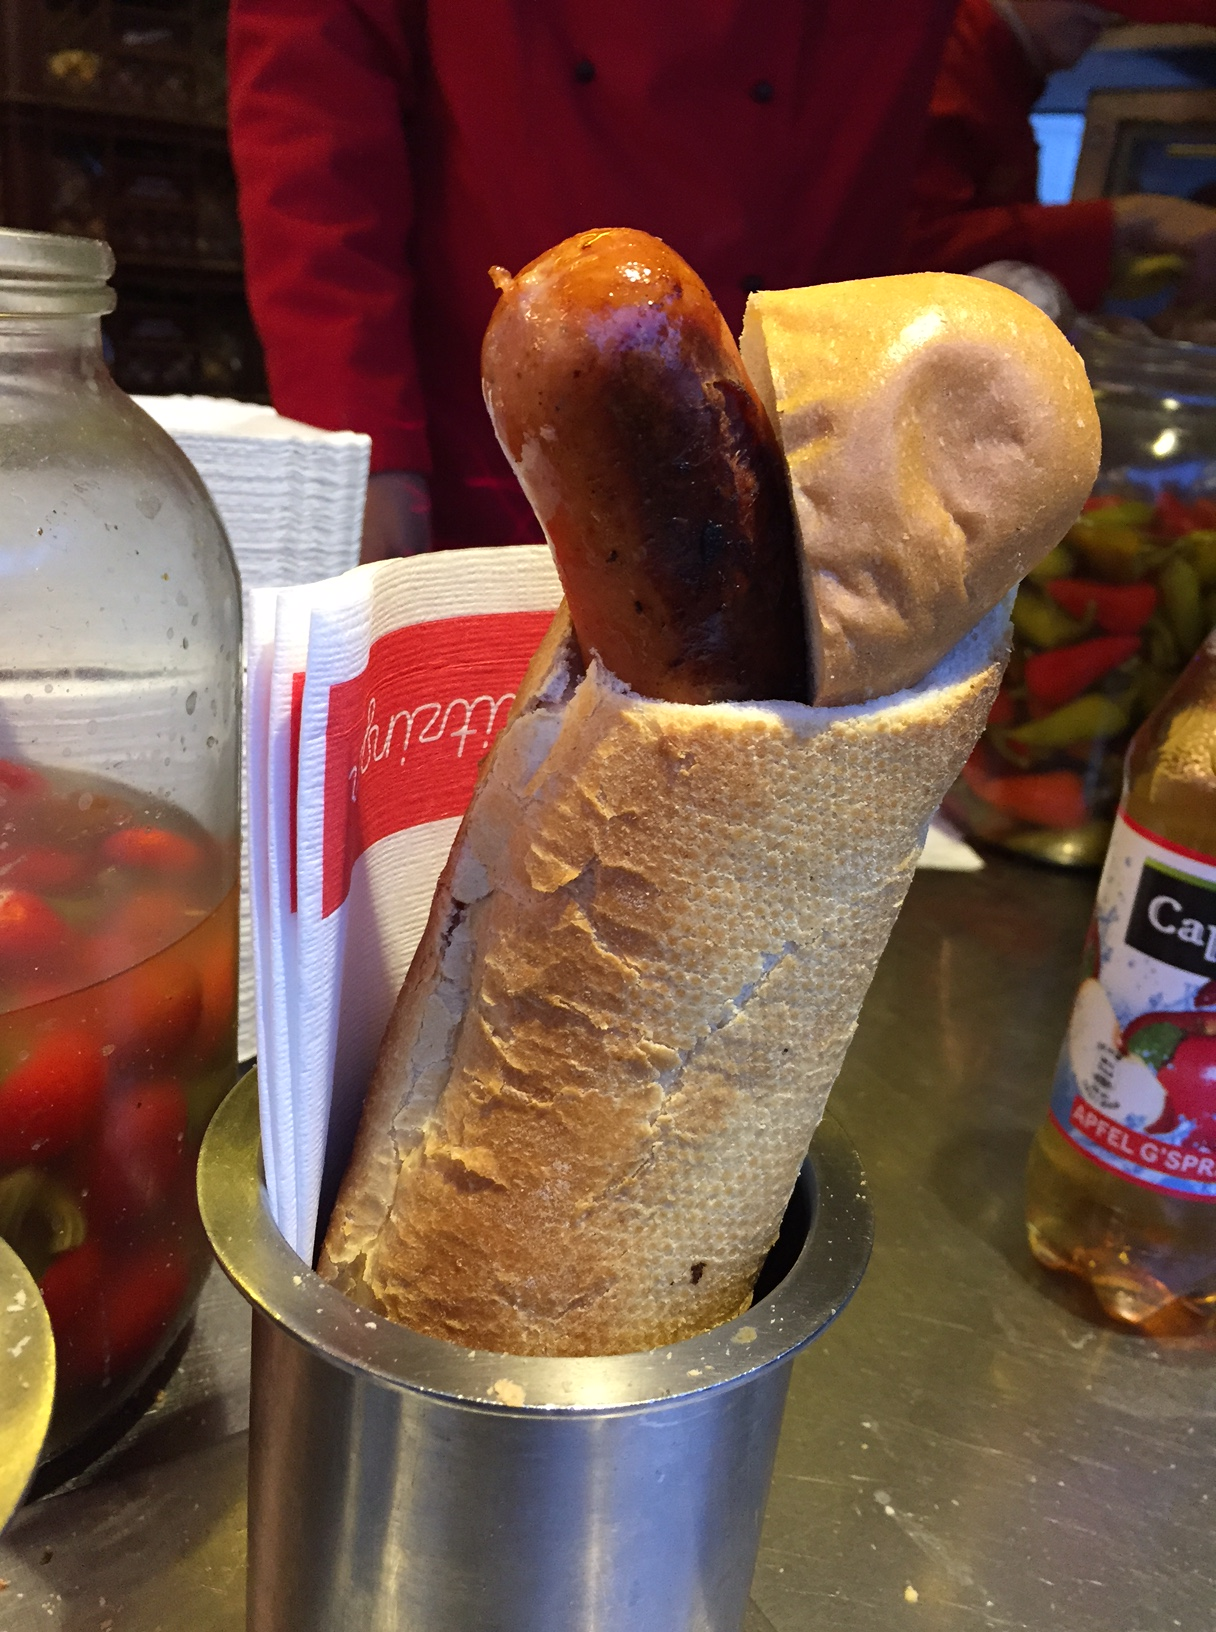 kasekrainer sausage